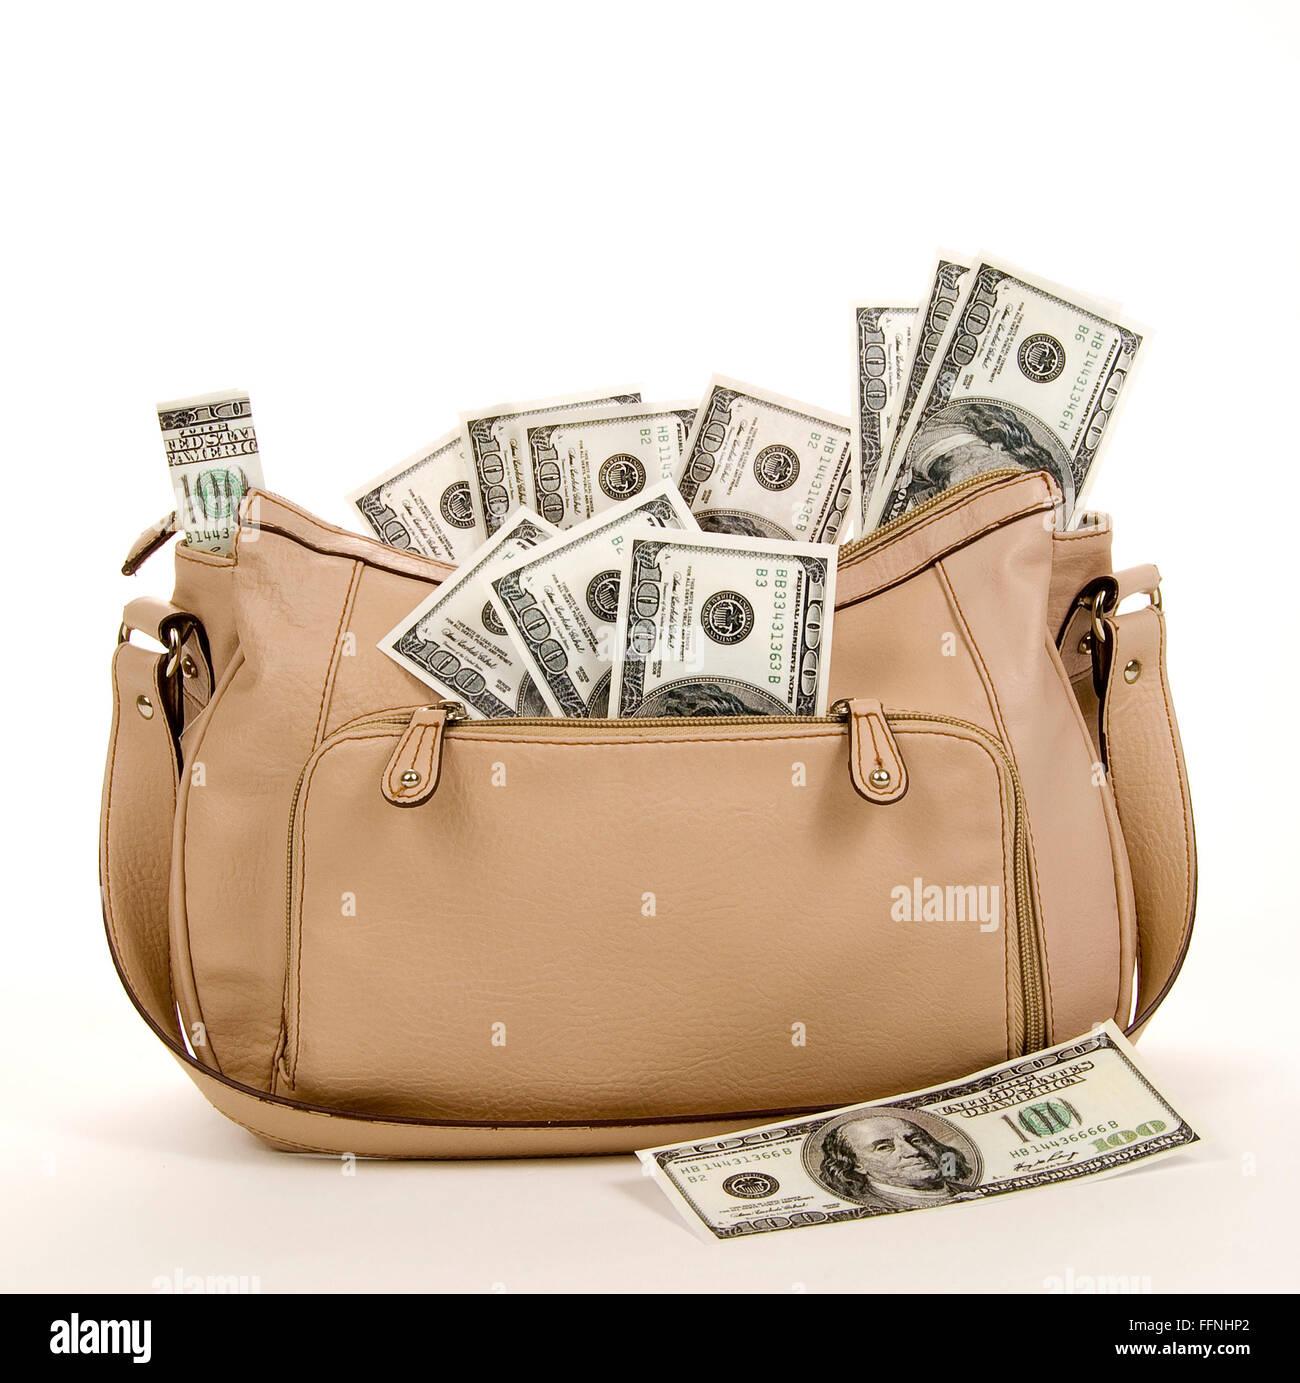 Purse Full of Money - Stock Image